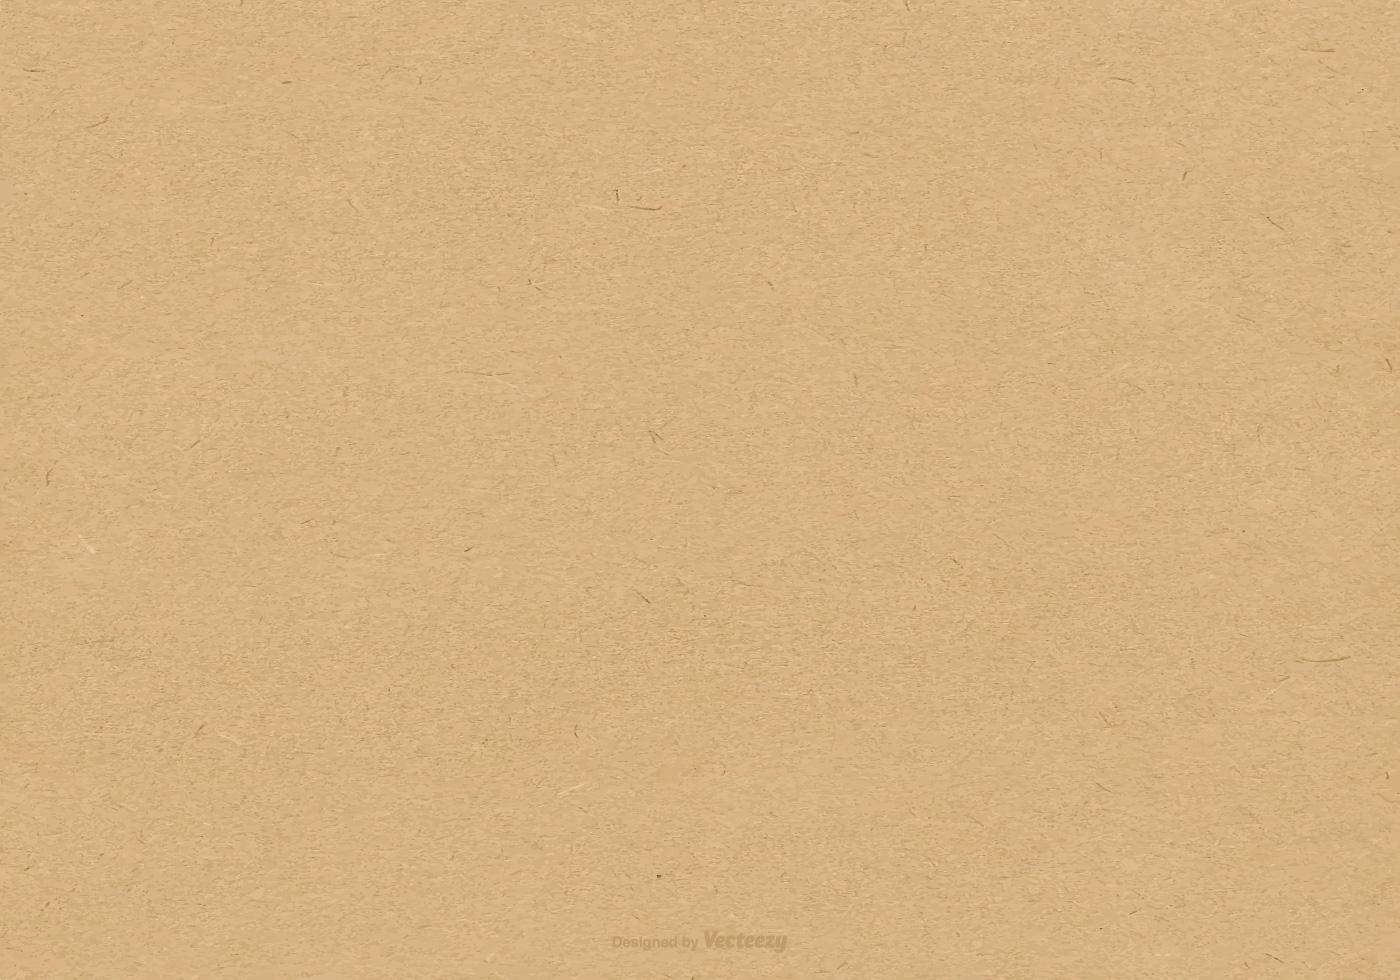 brown paper texture Brown paper bag texture free brown paper bag texture hd.